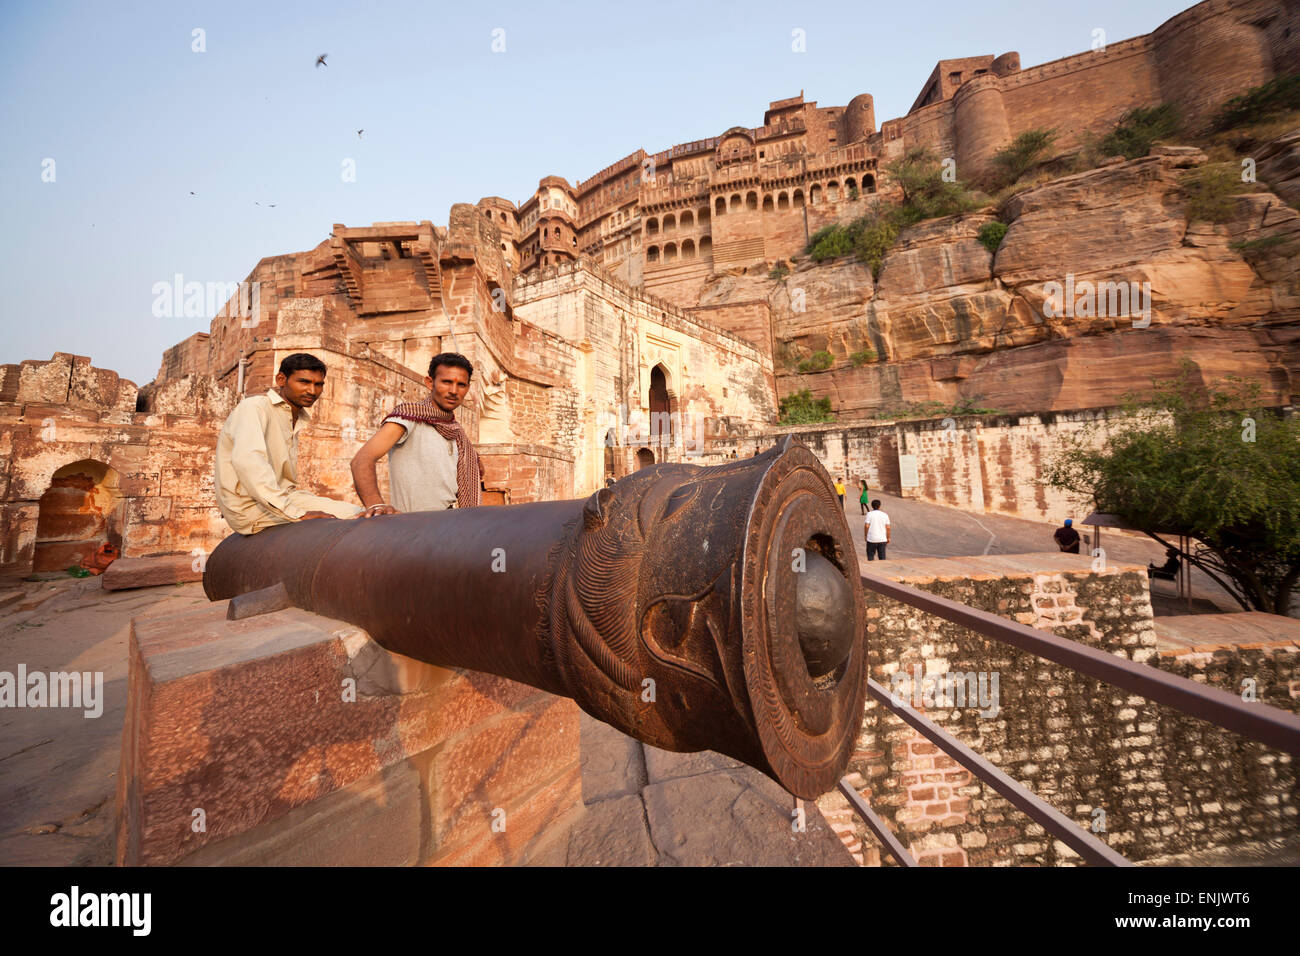 Fort Meherangarh, Jodhpur, Rajasthan, India - Stock Image